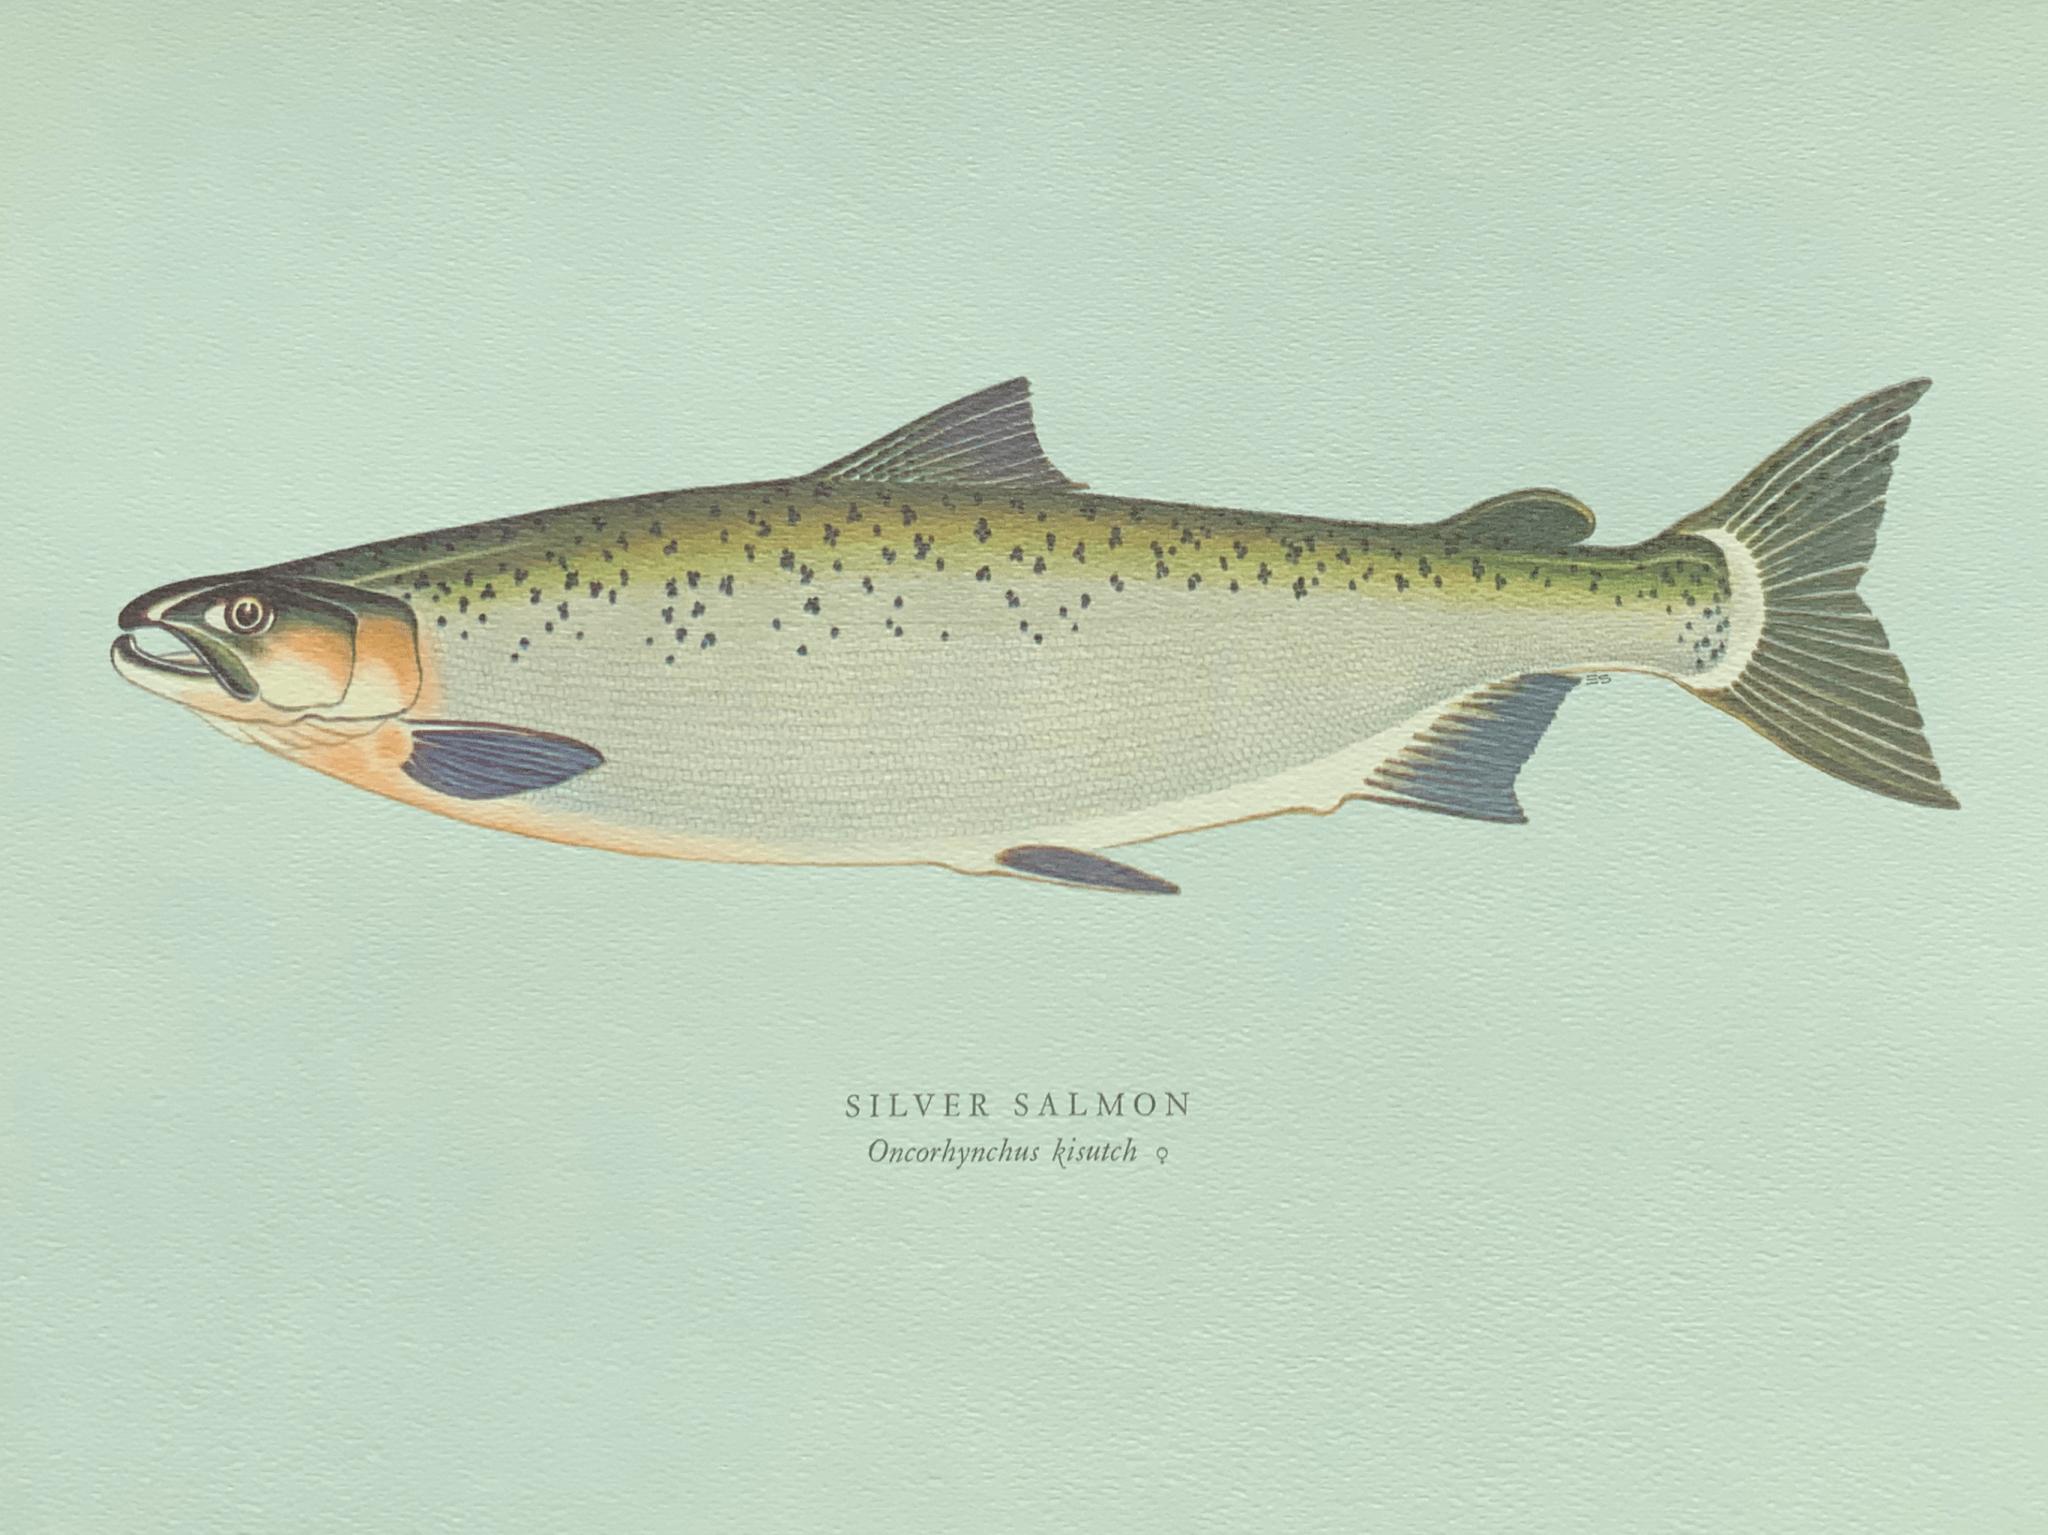 Silver salmon 銀鮭魚 銀鮭魚是釣魚郎的至愛,一來因為牠們喜歡浮近水面, 二來一旦上釣,瘋狂打轉,引得釣魚郎樂不可支。一般重四至十磅。